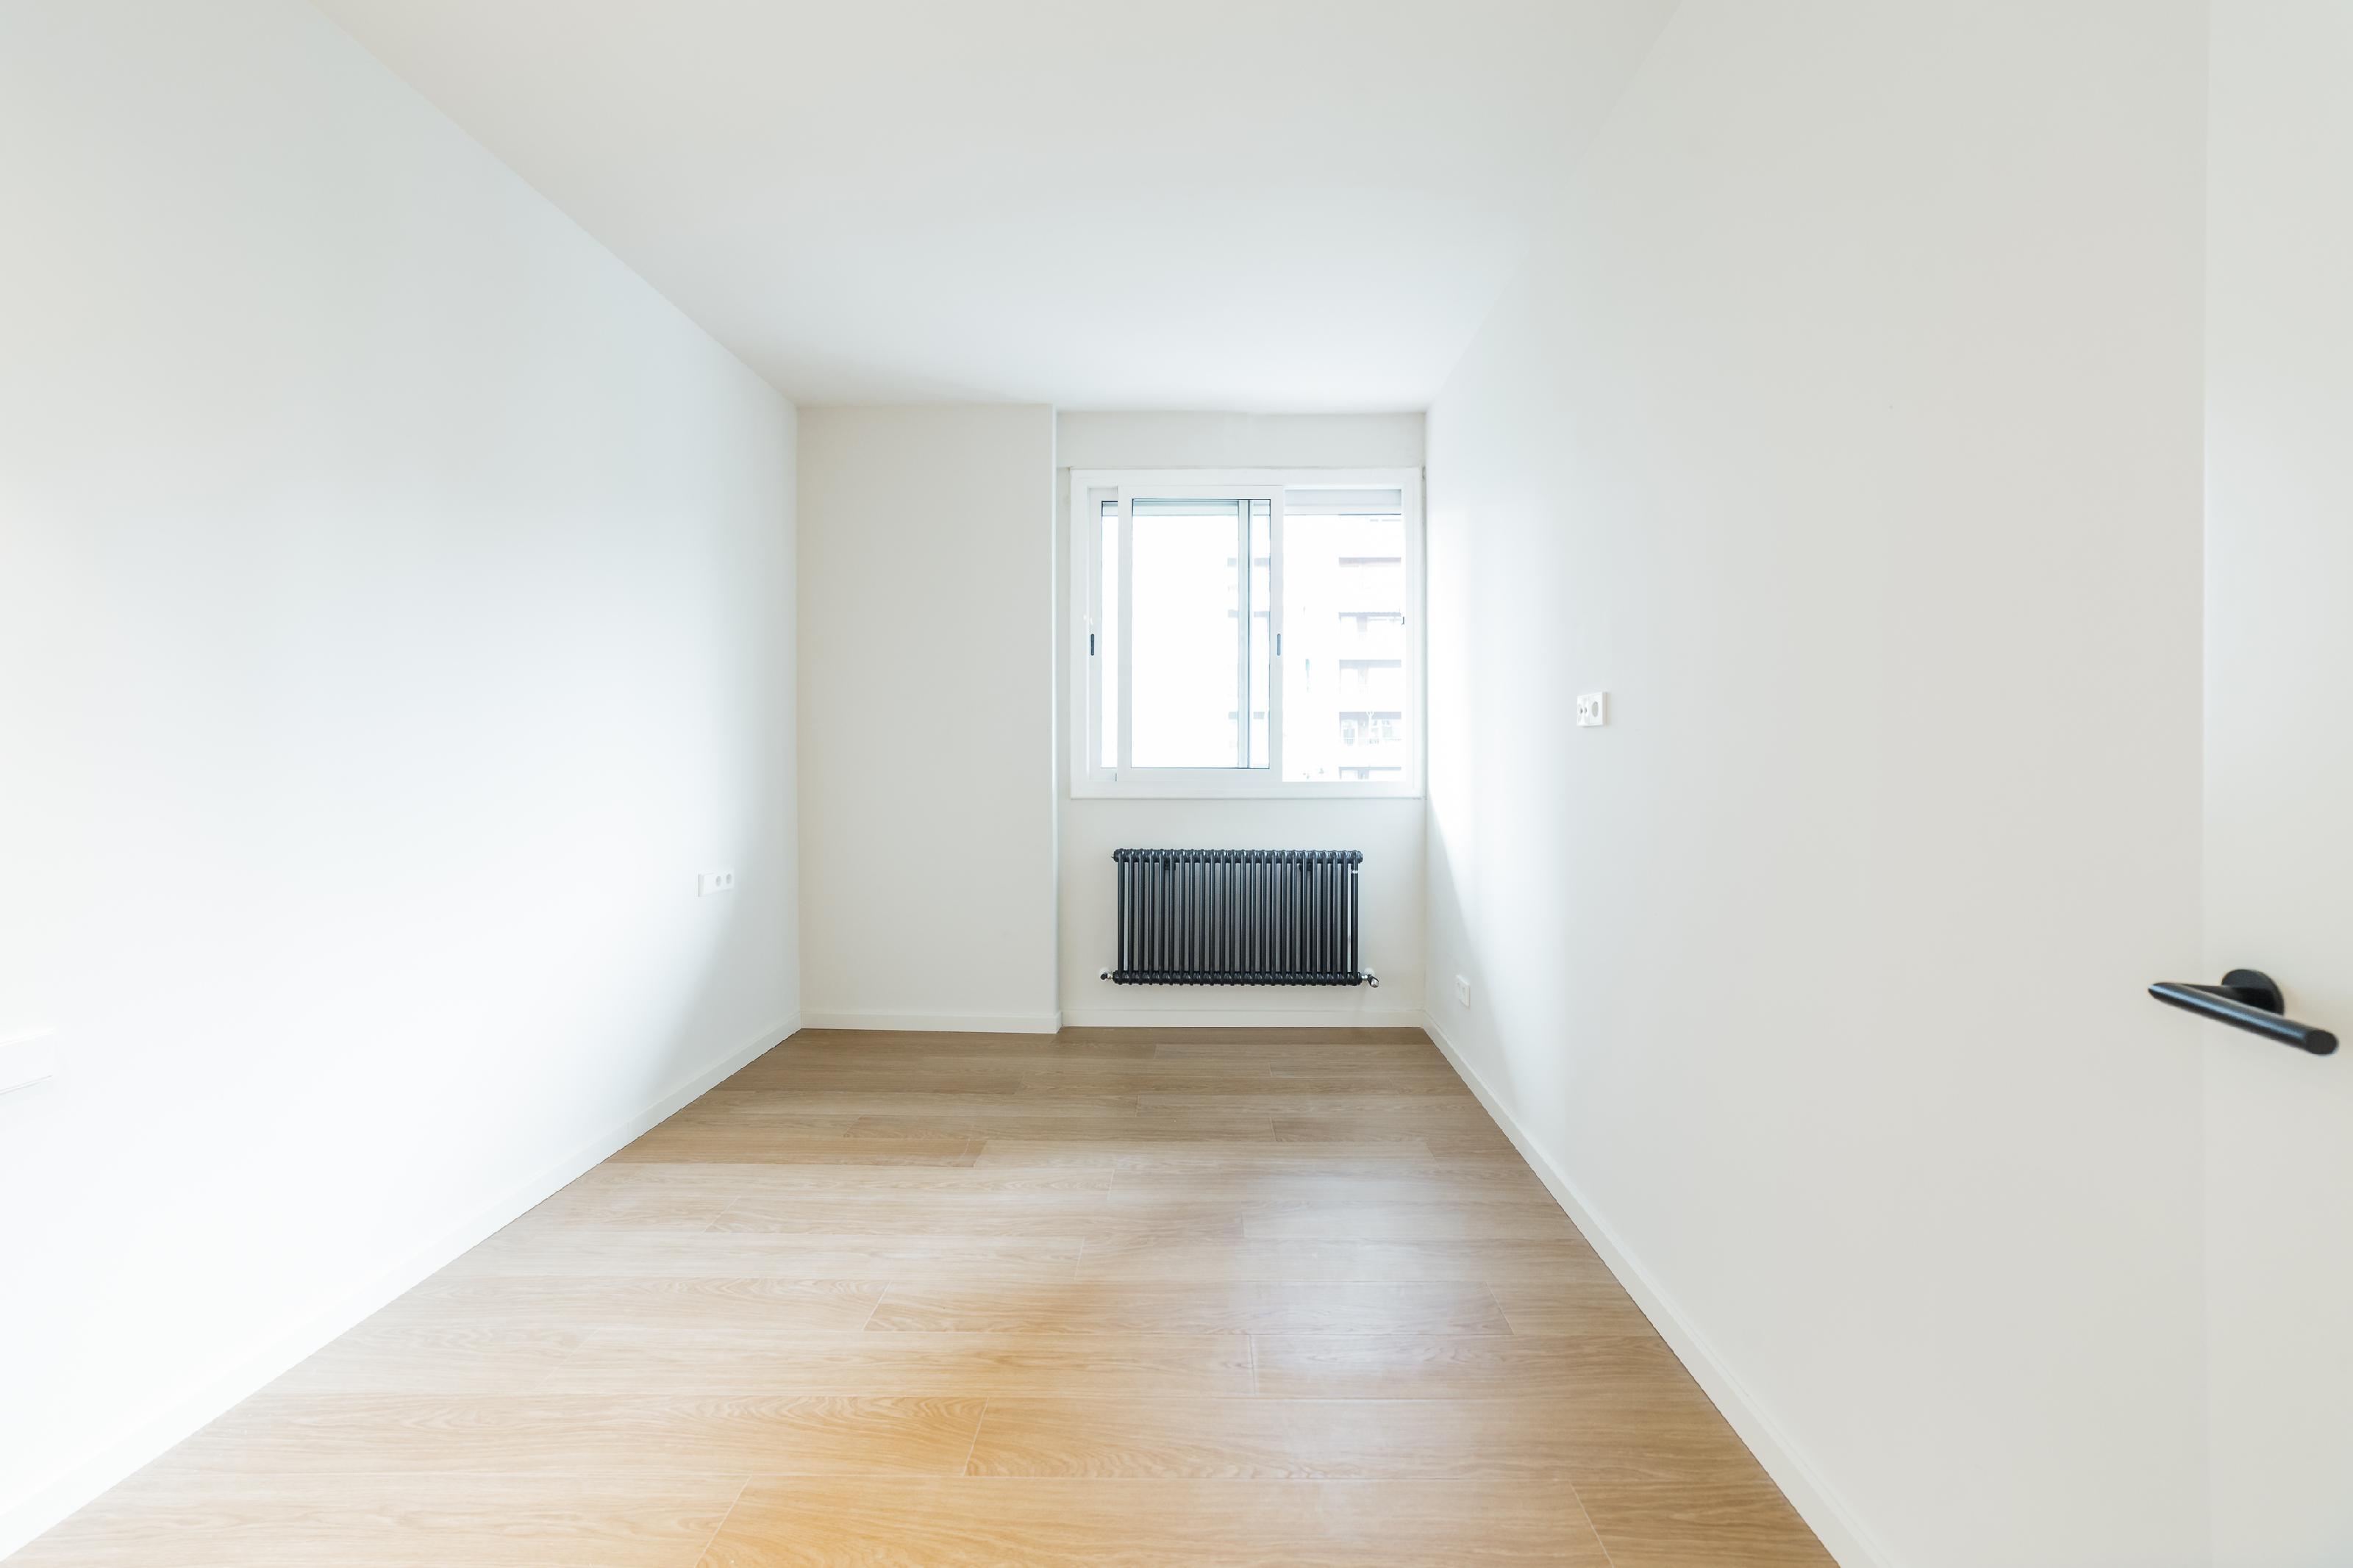 253492 Flat for sale in Sarrià-Sant Gervasi, Sant Gervasi-Galvany 33